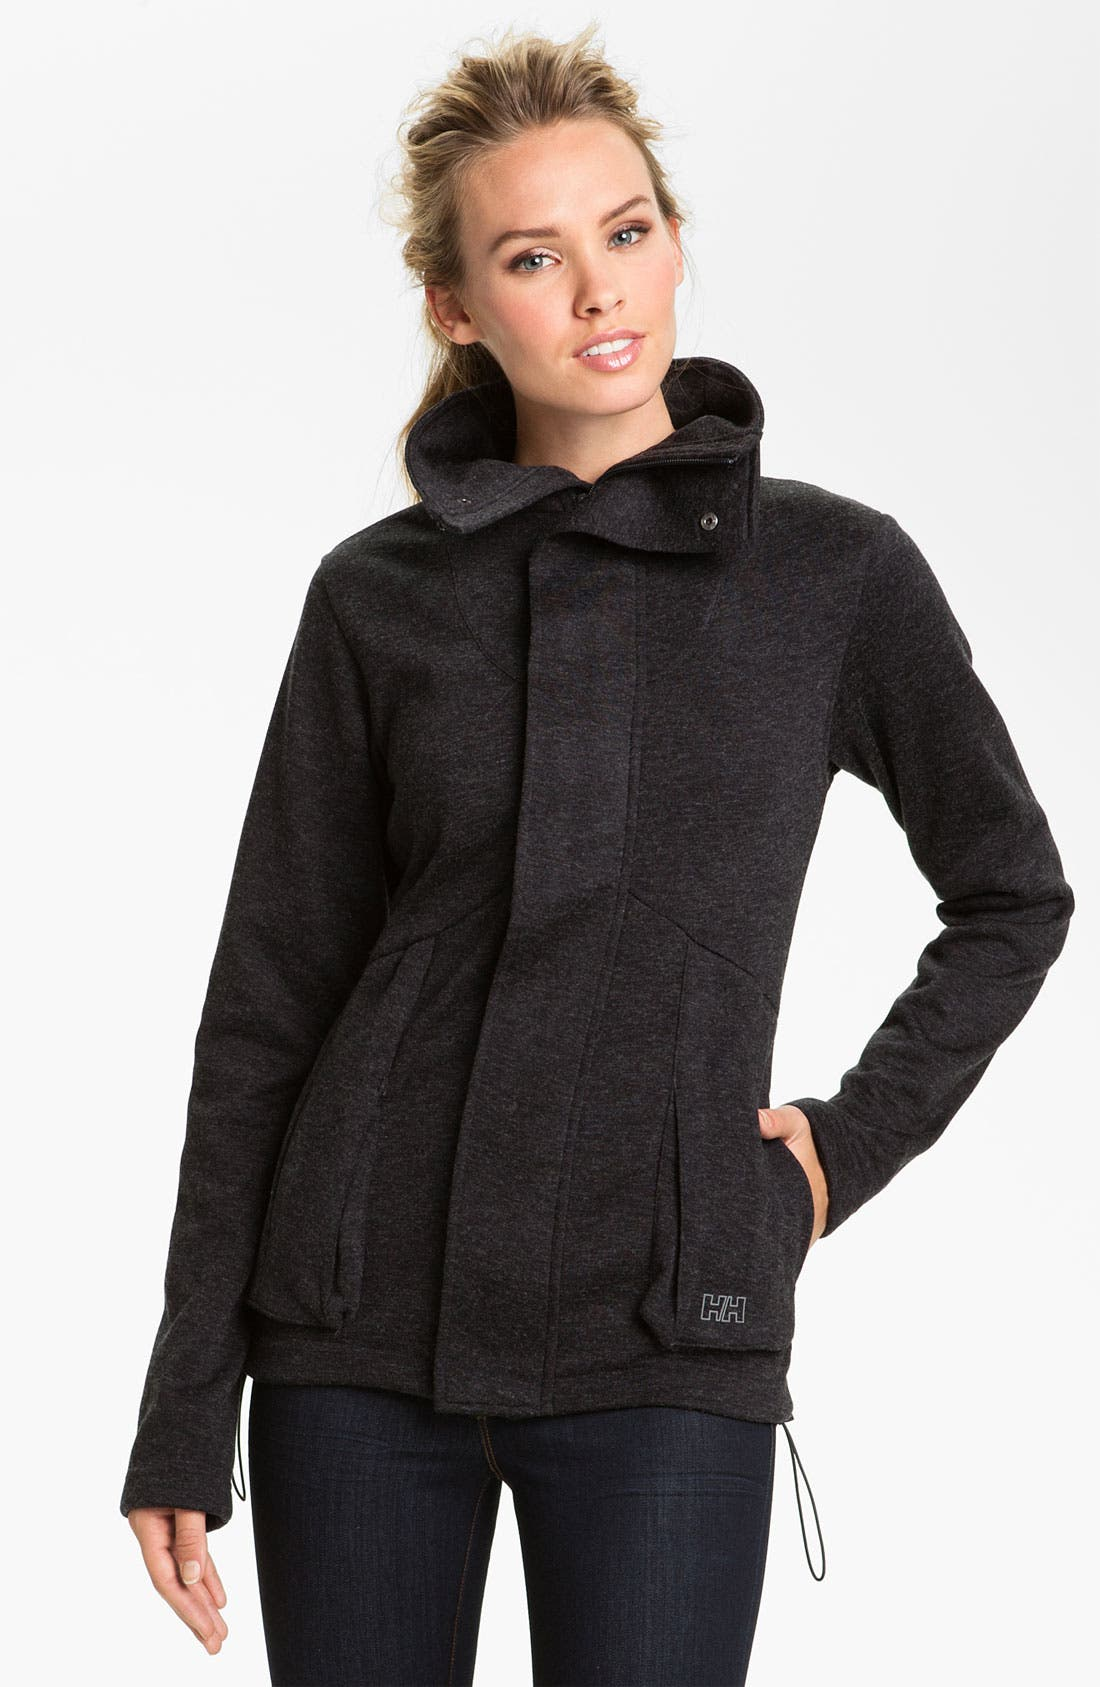 Main Image - Helly Hansen 'Sheer Bliss' Jacket